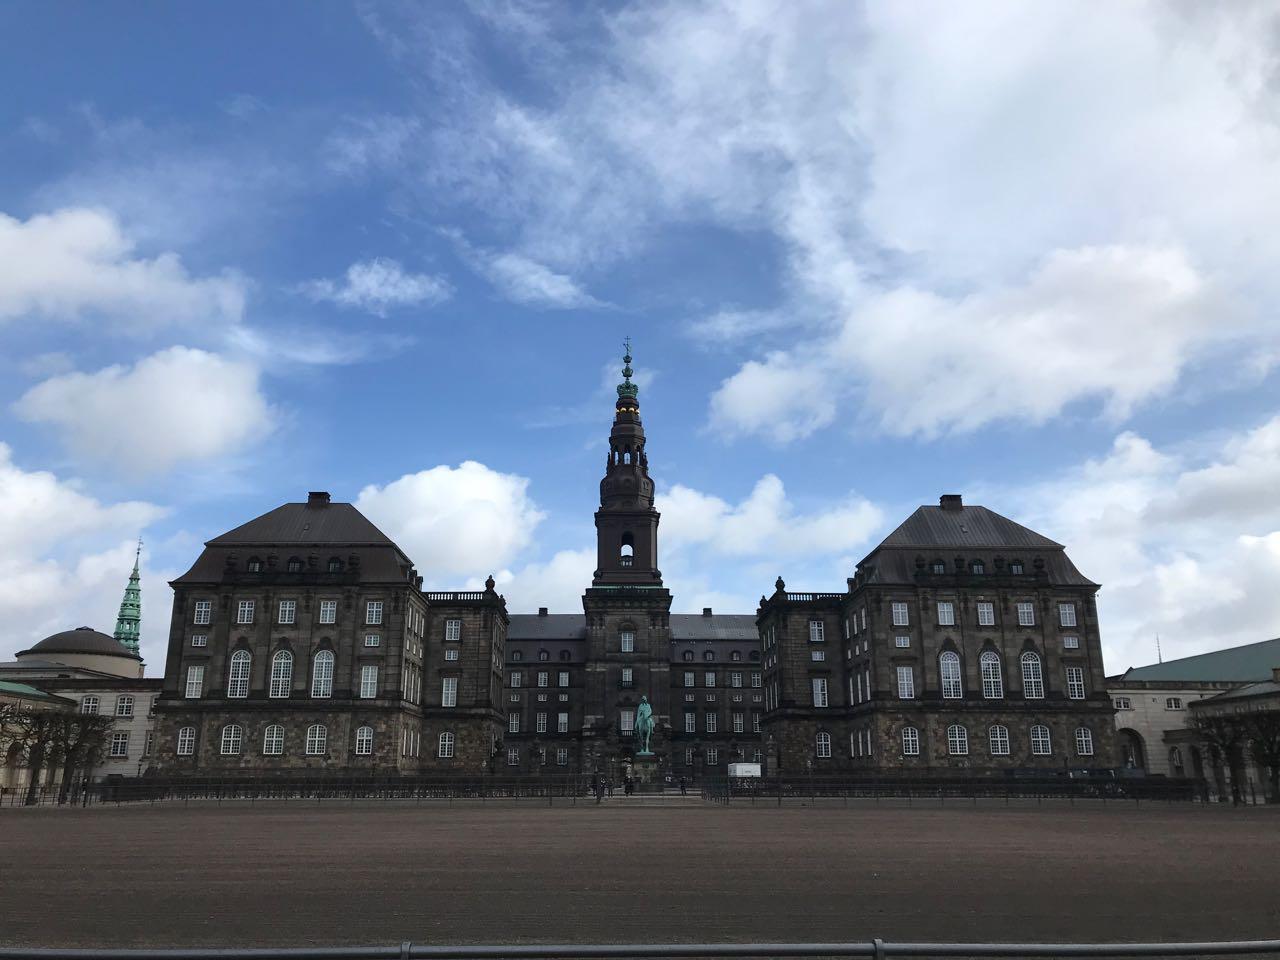 back of Christiansborg Slot